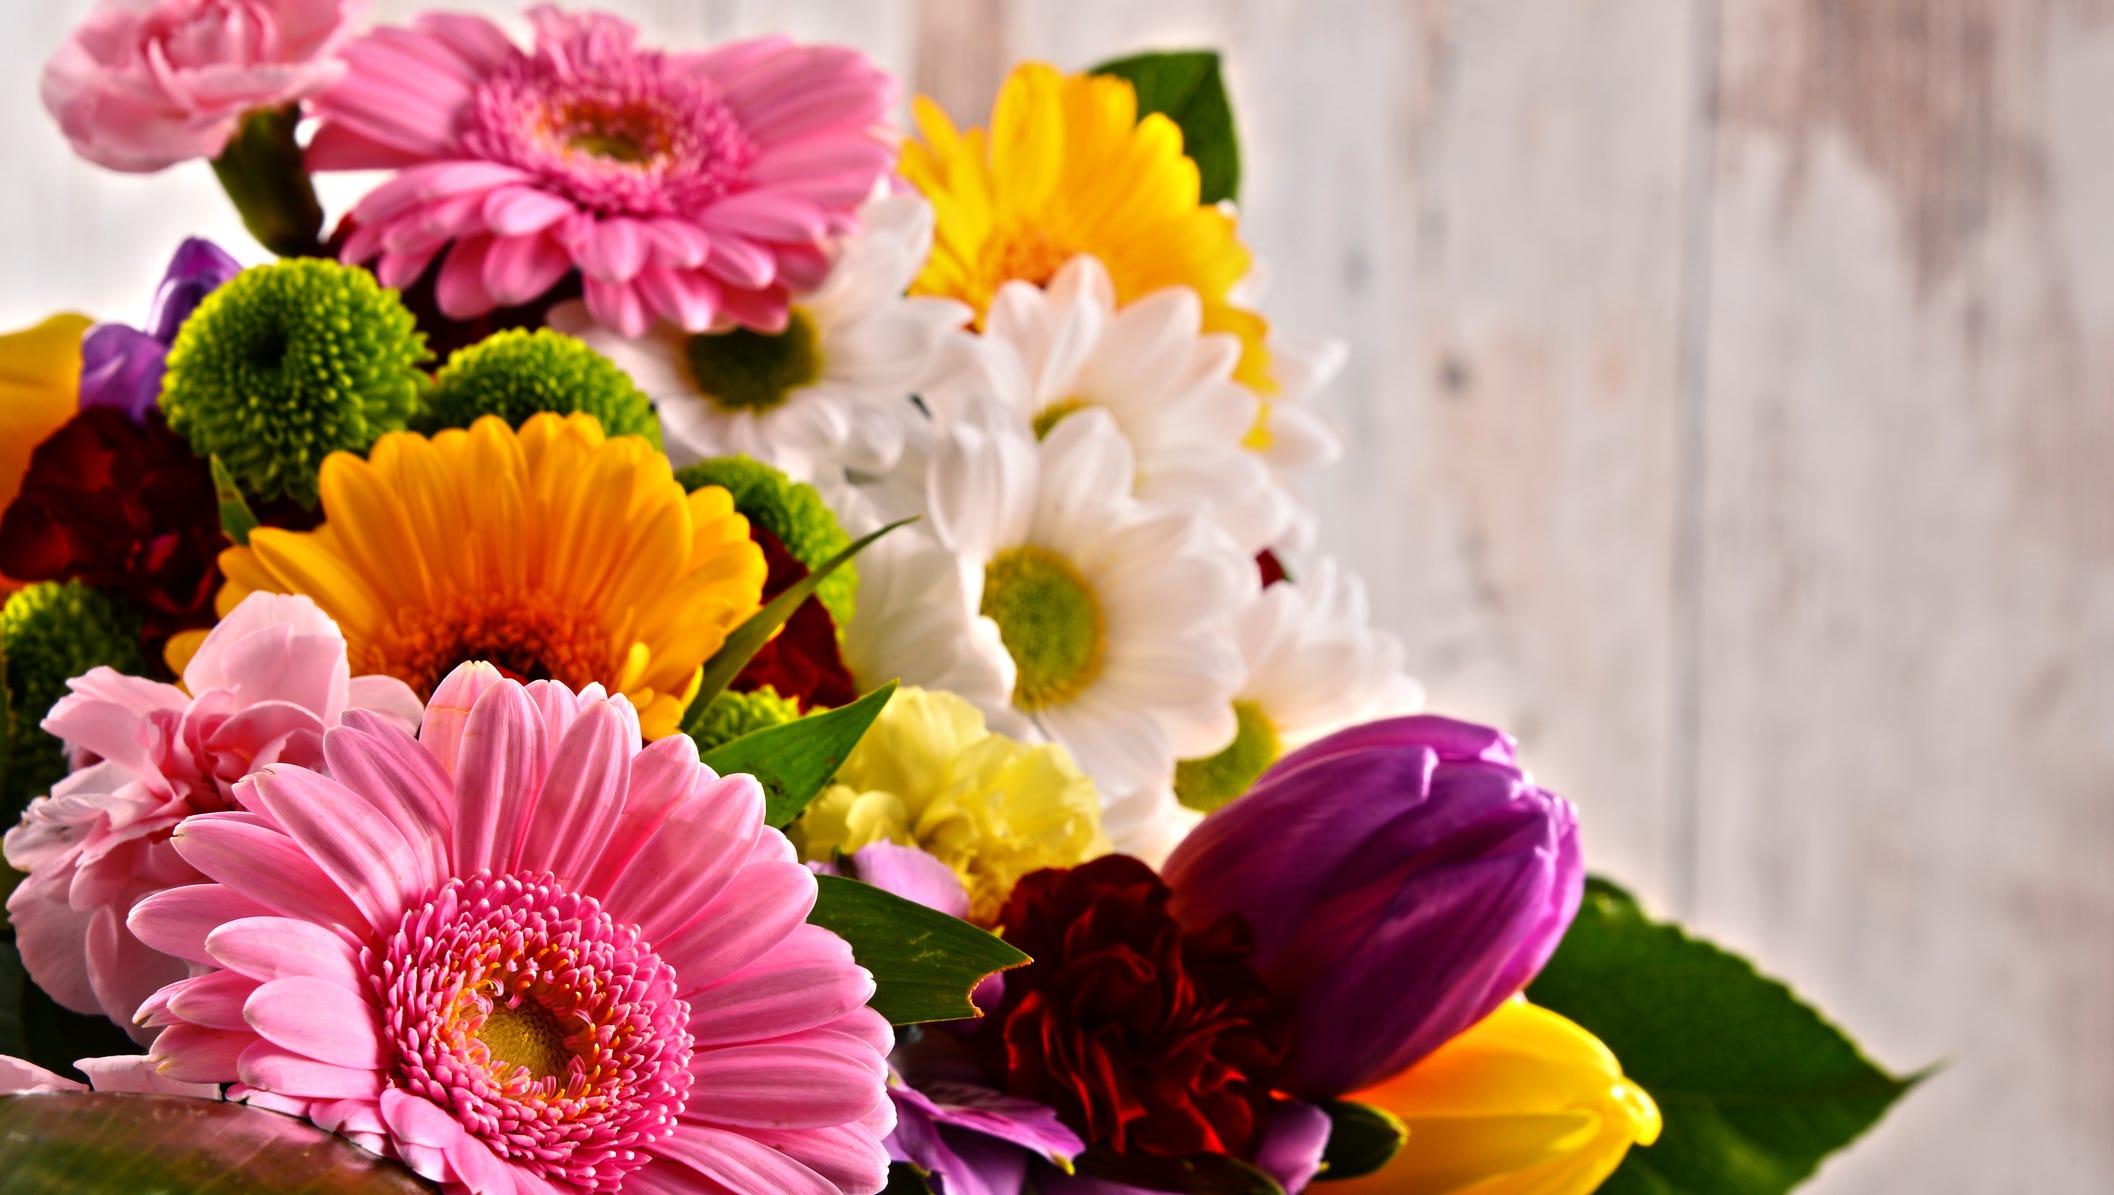 Enjoy 20% off 1 800 Flowers